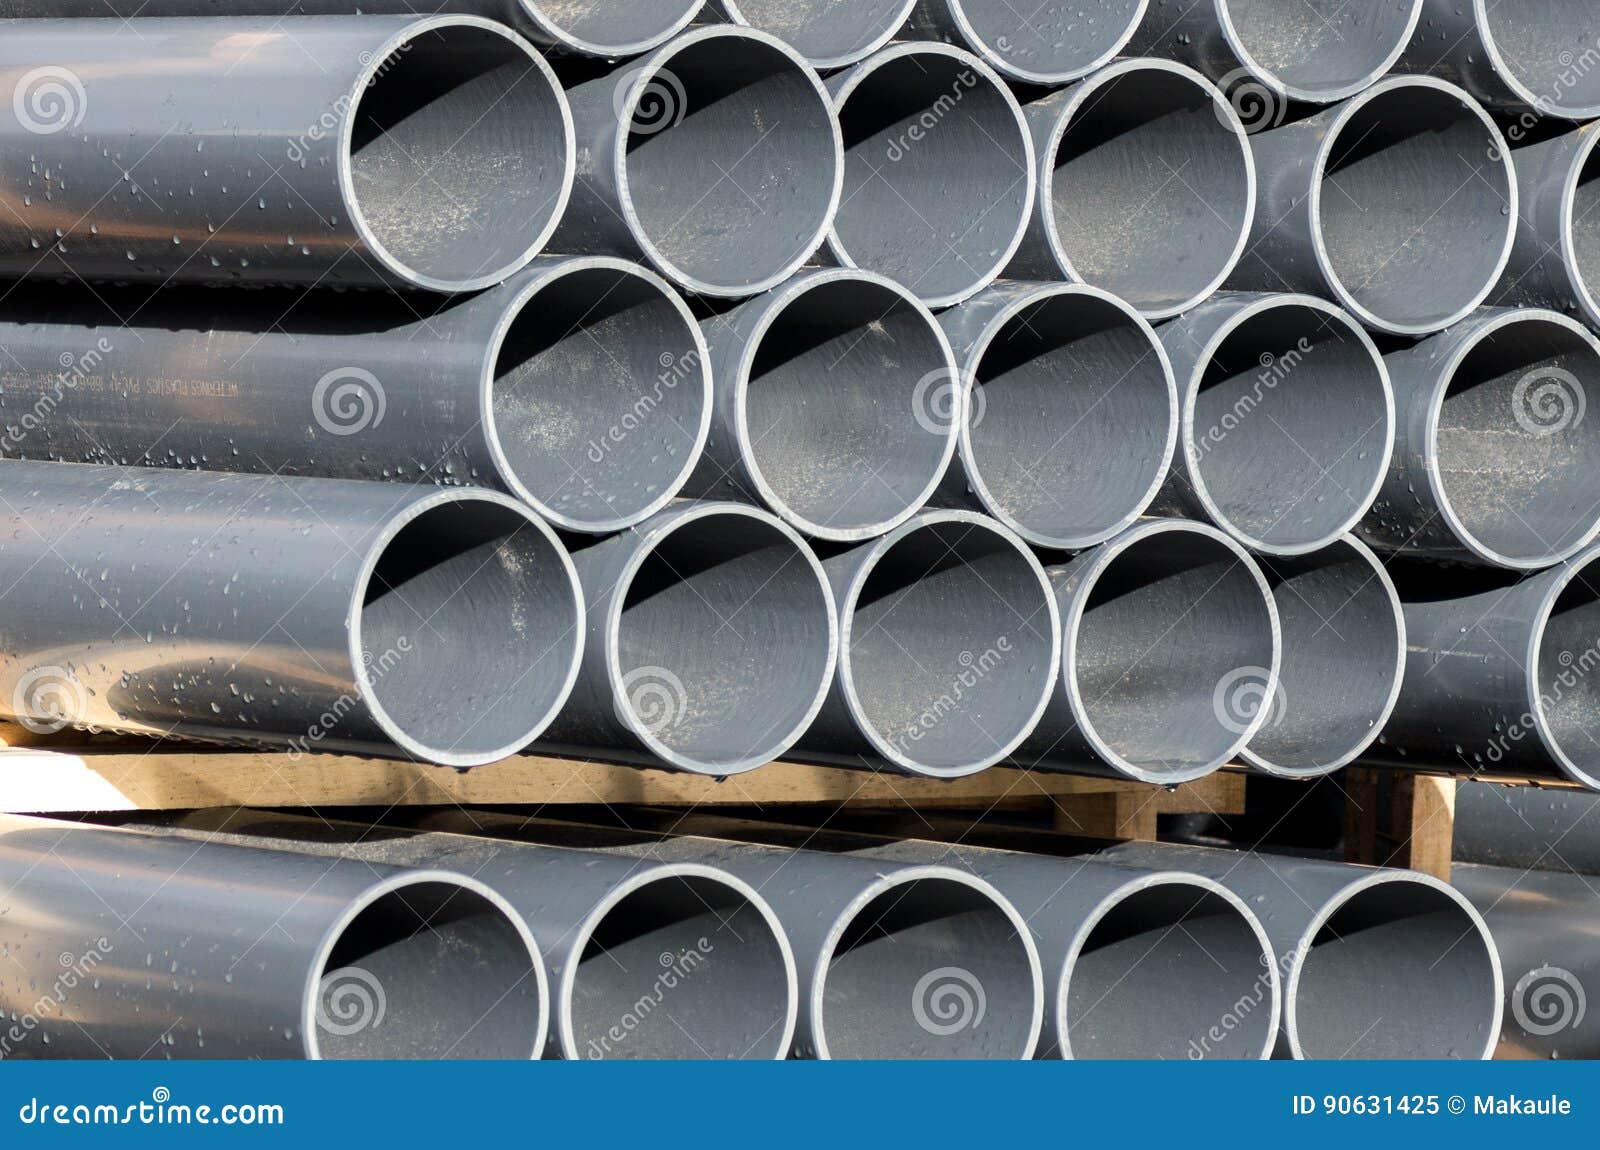 PVC Pipe Gray Royalty-Free Stock Photo